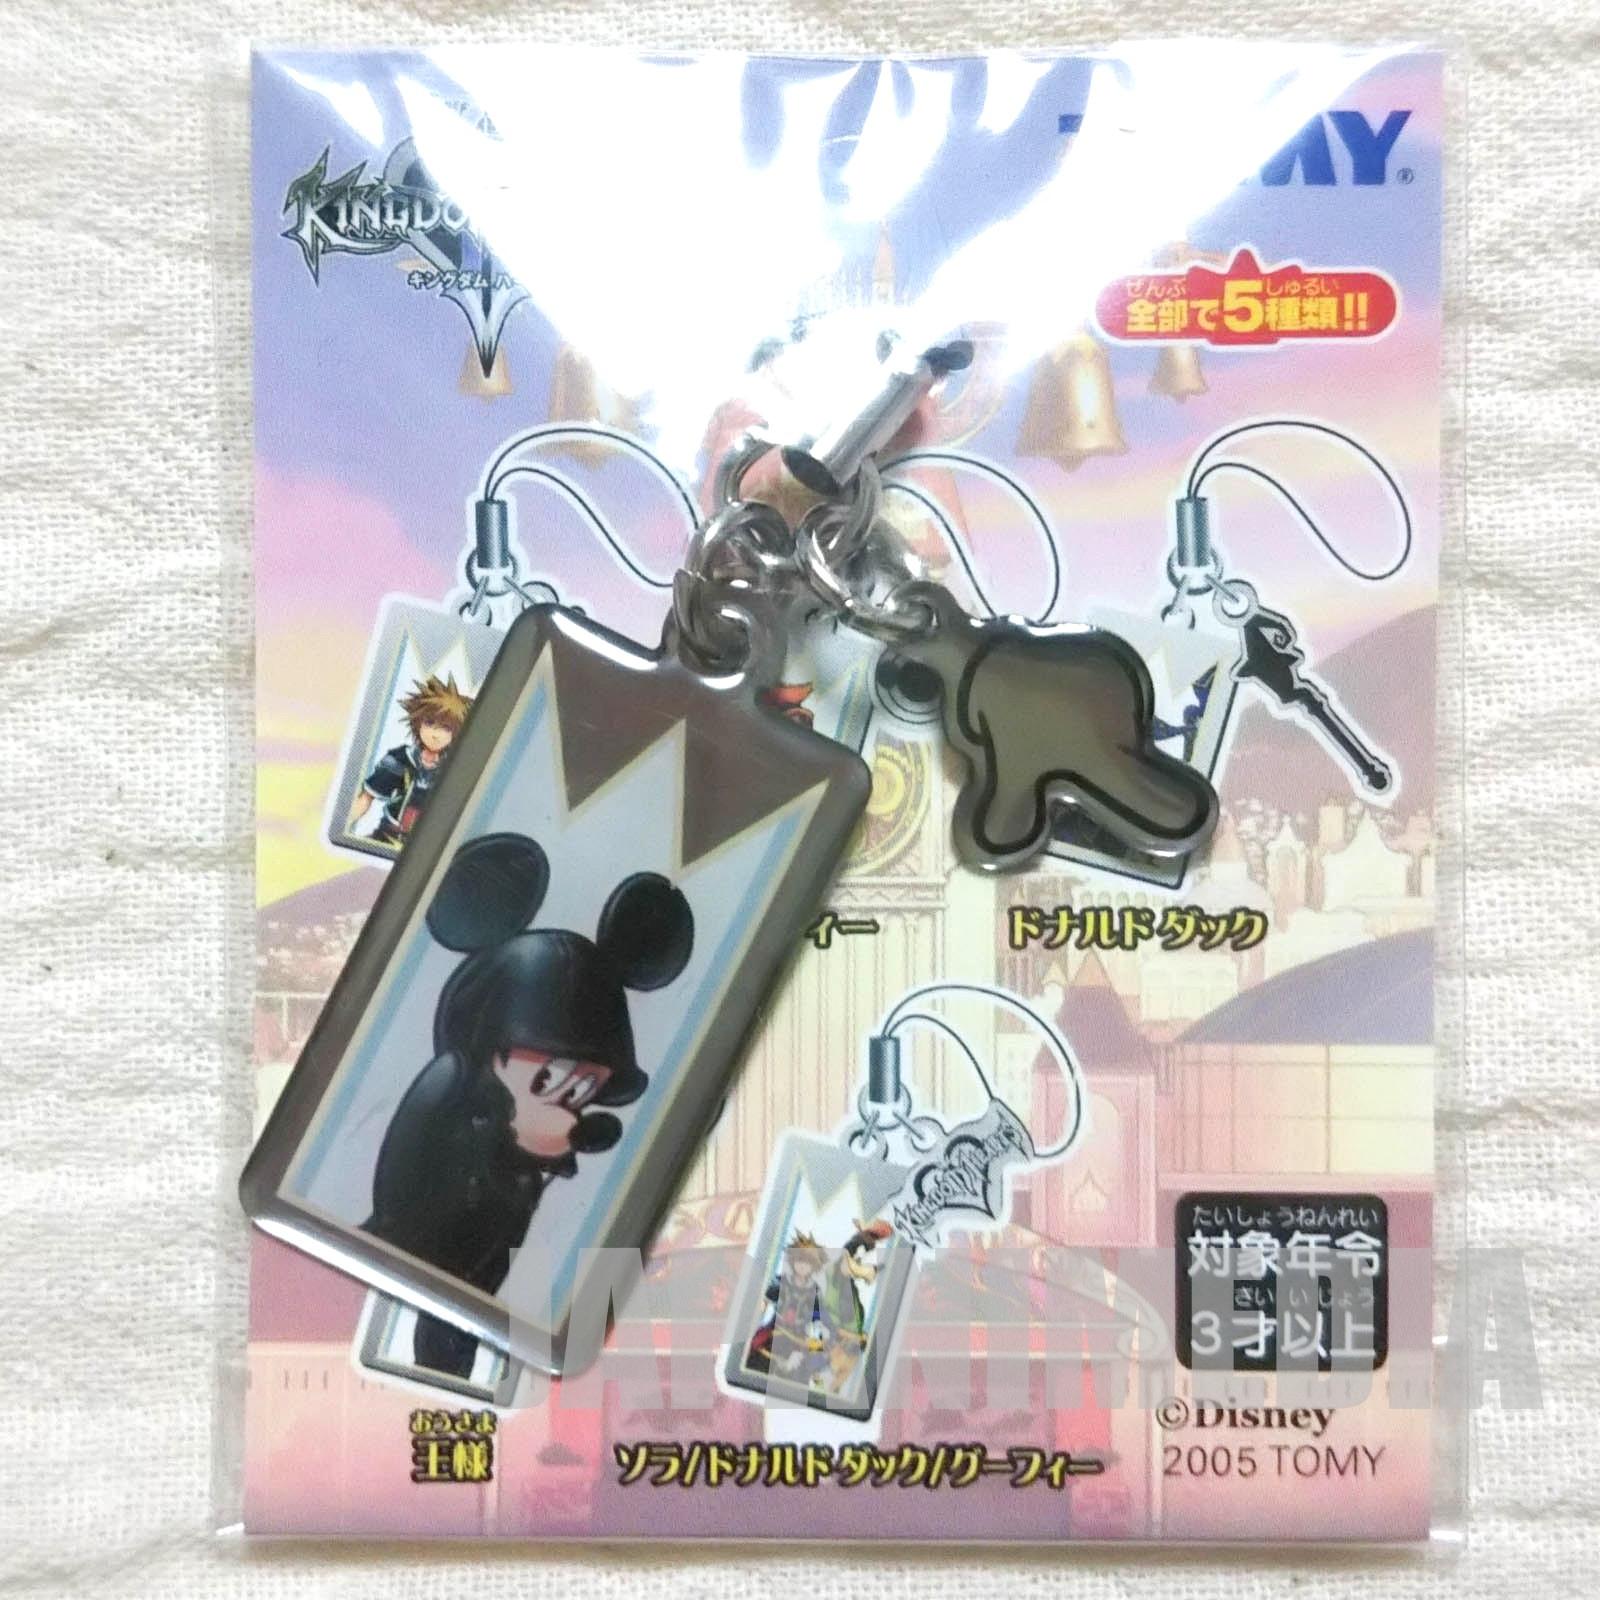 Kingdom Hearts 2 King (Mickey) Charm Strap Square Enix JAPAN GAME